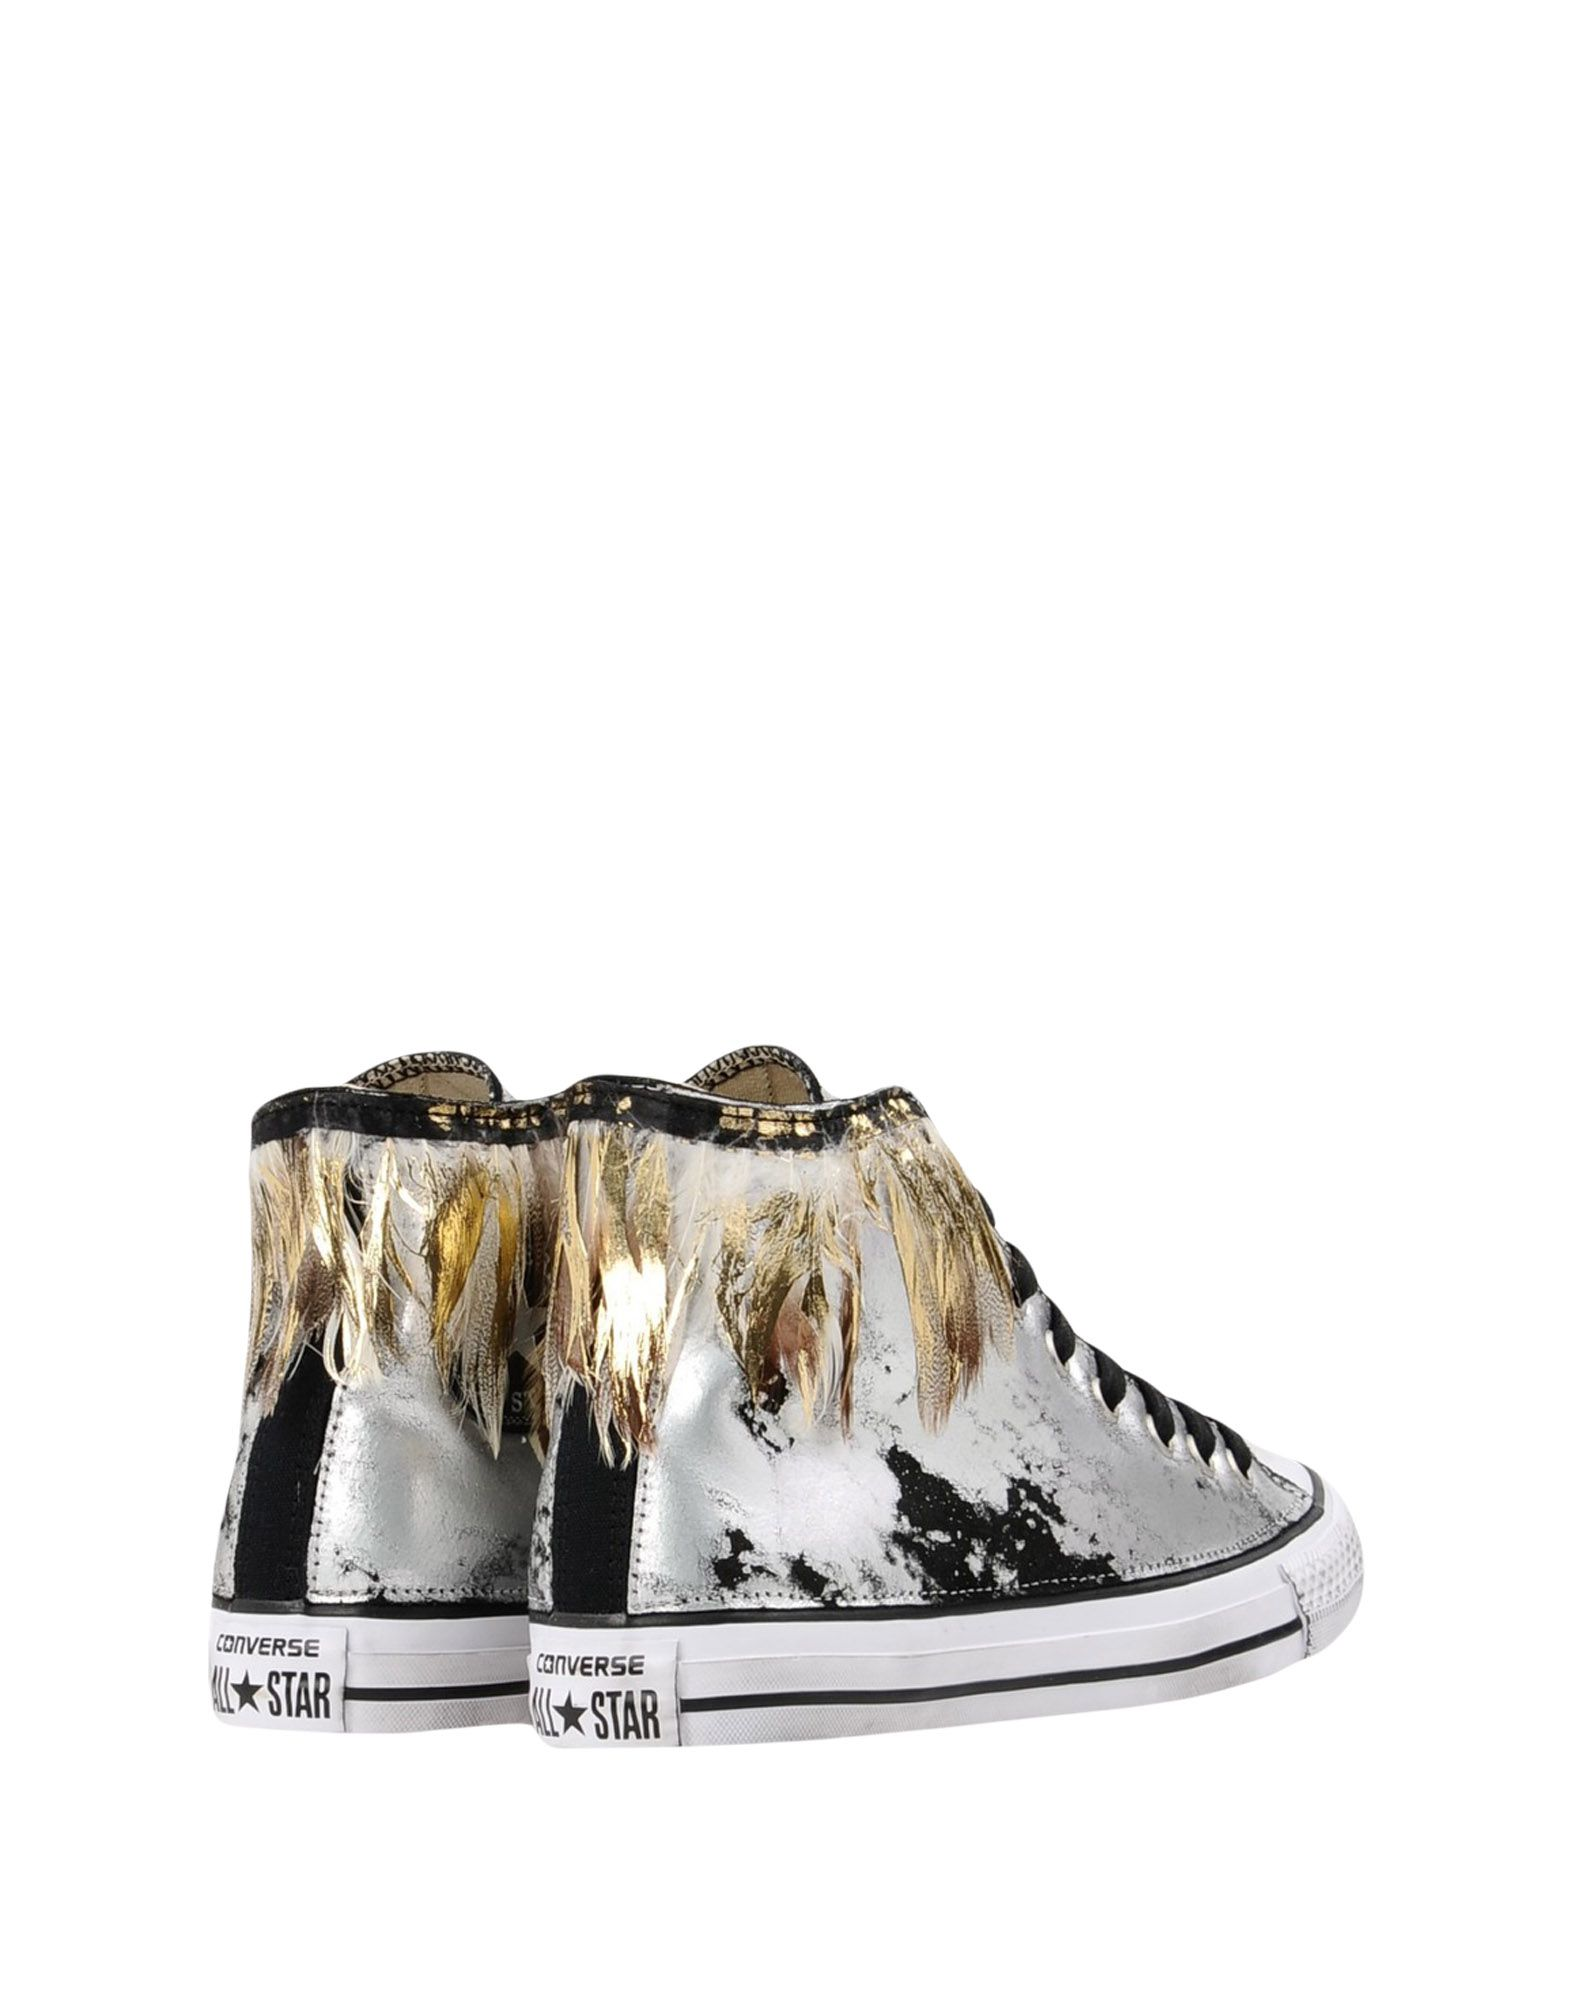 Sneakers Converse Limited Edition Ctas Hi Canvas/Leather Ltd - Femme - Sneakers Converse Limited Edition sur